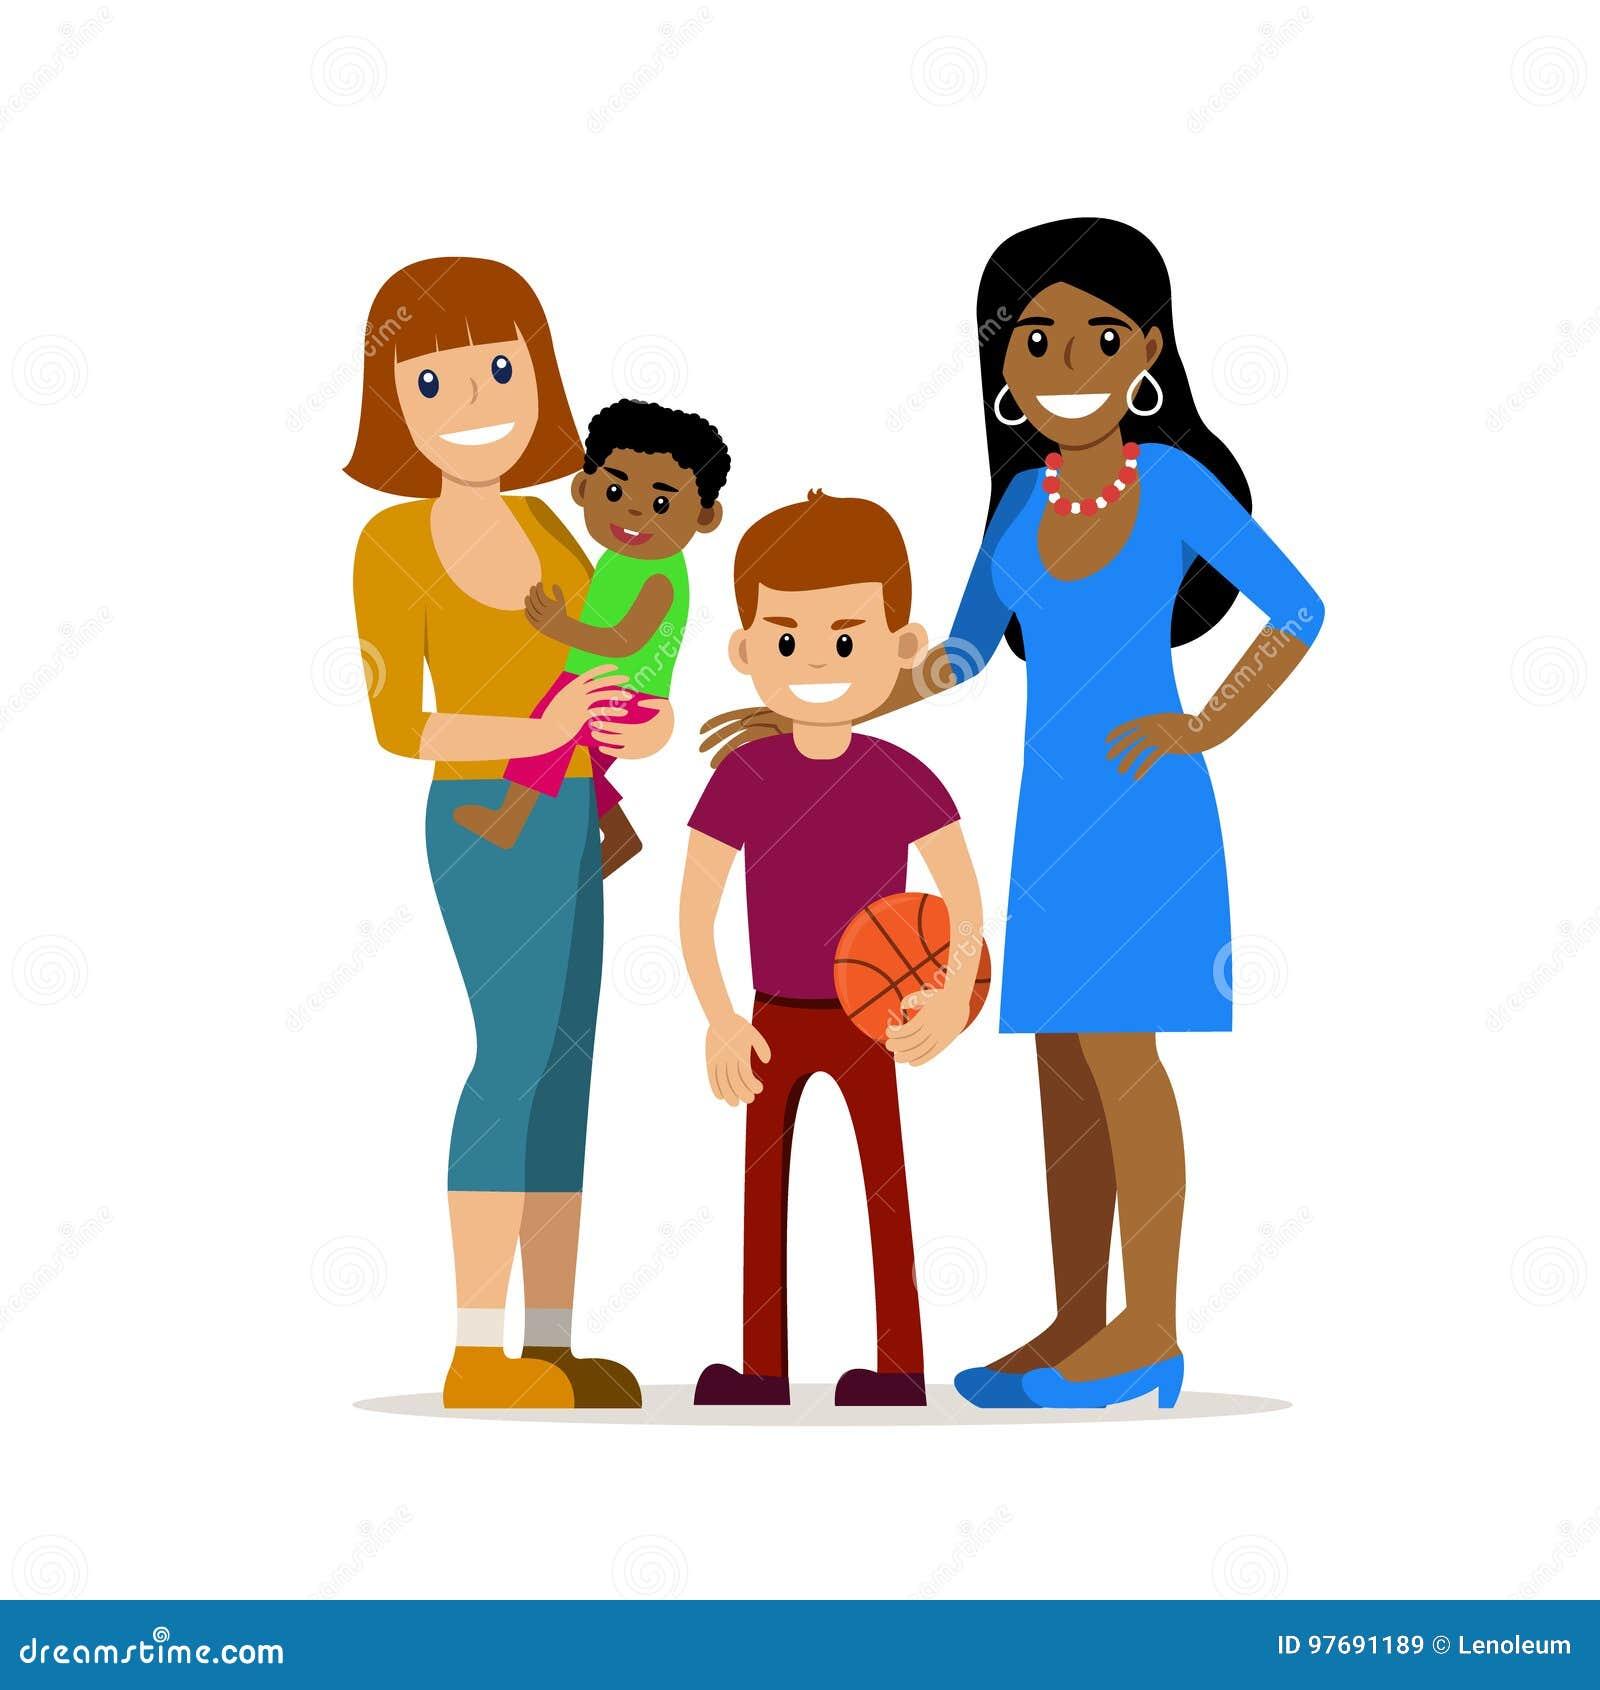 same sex families cartoon pictures in Atlanta